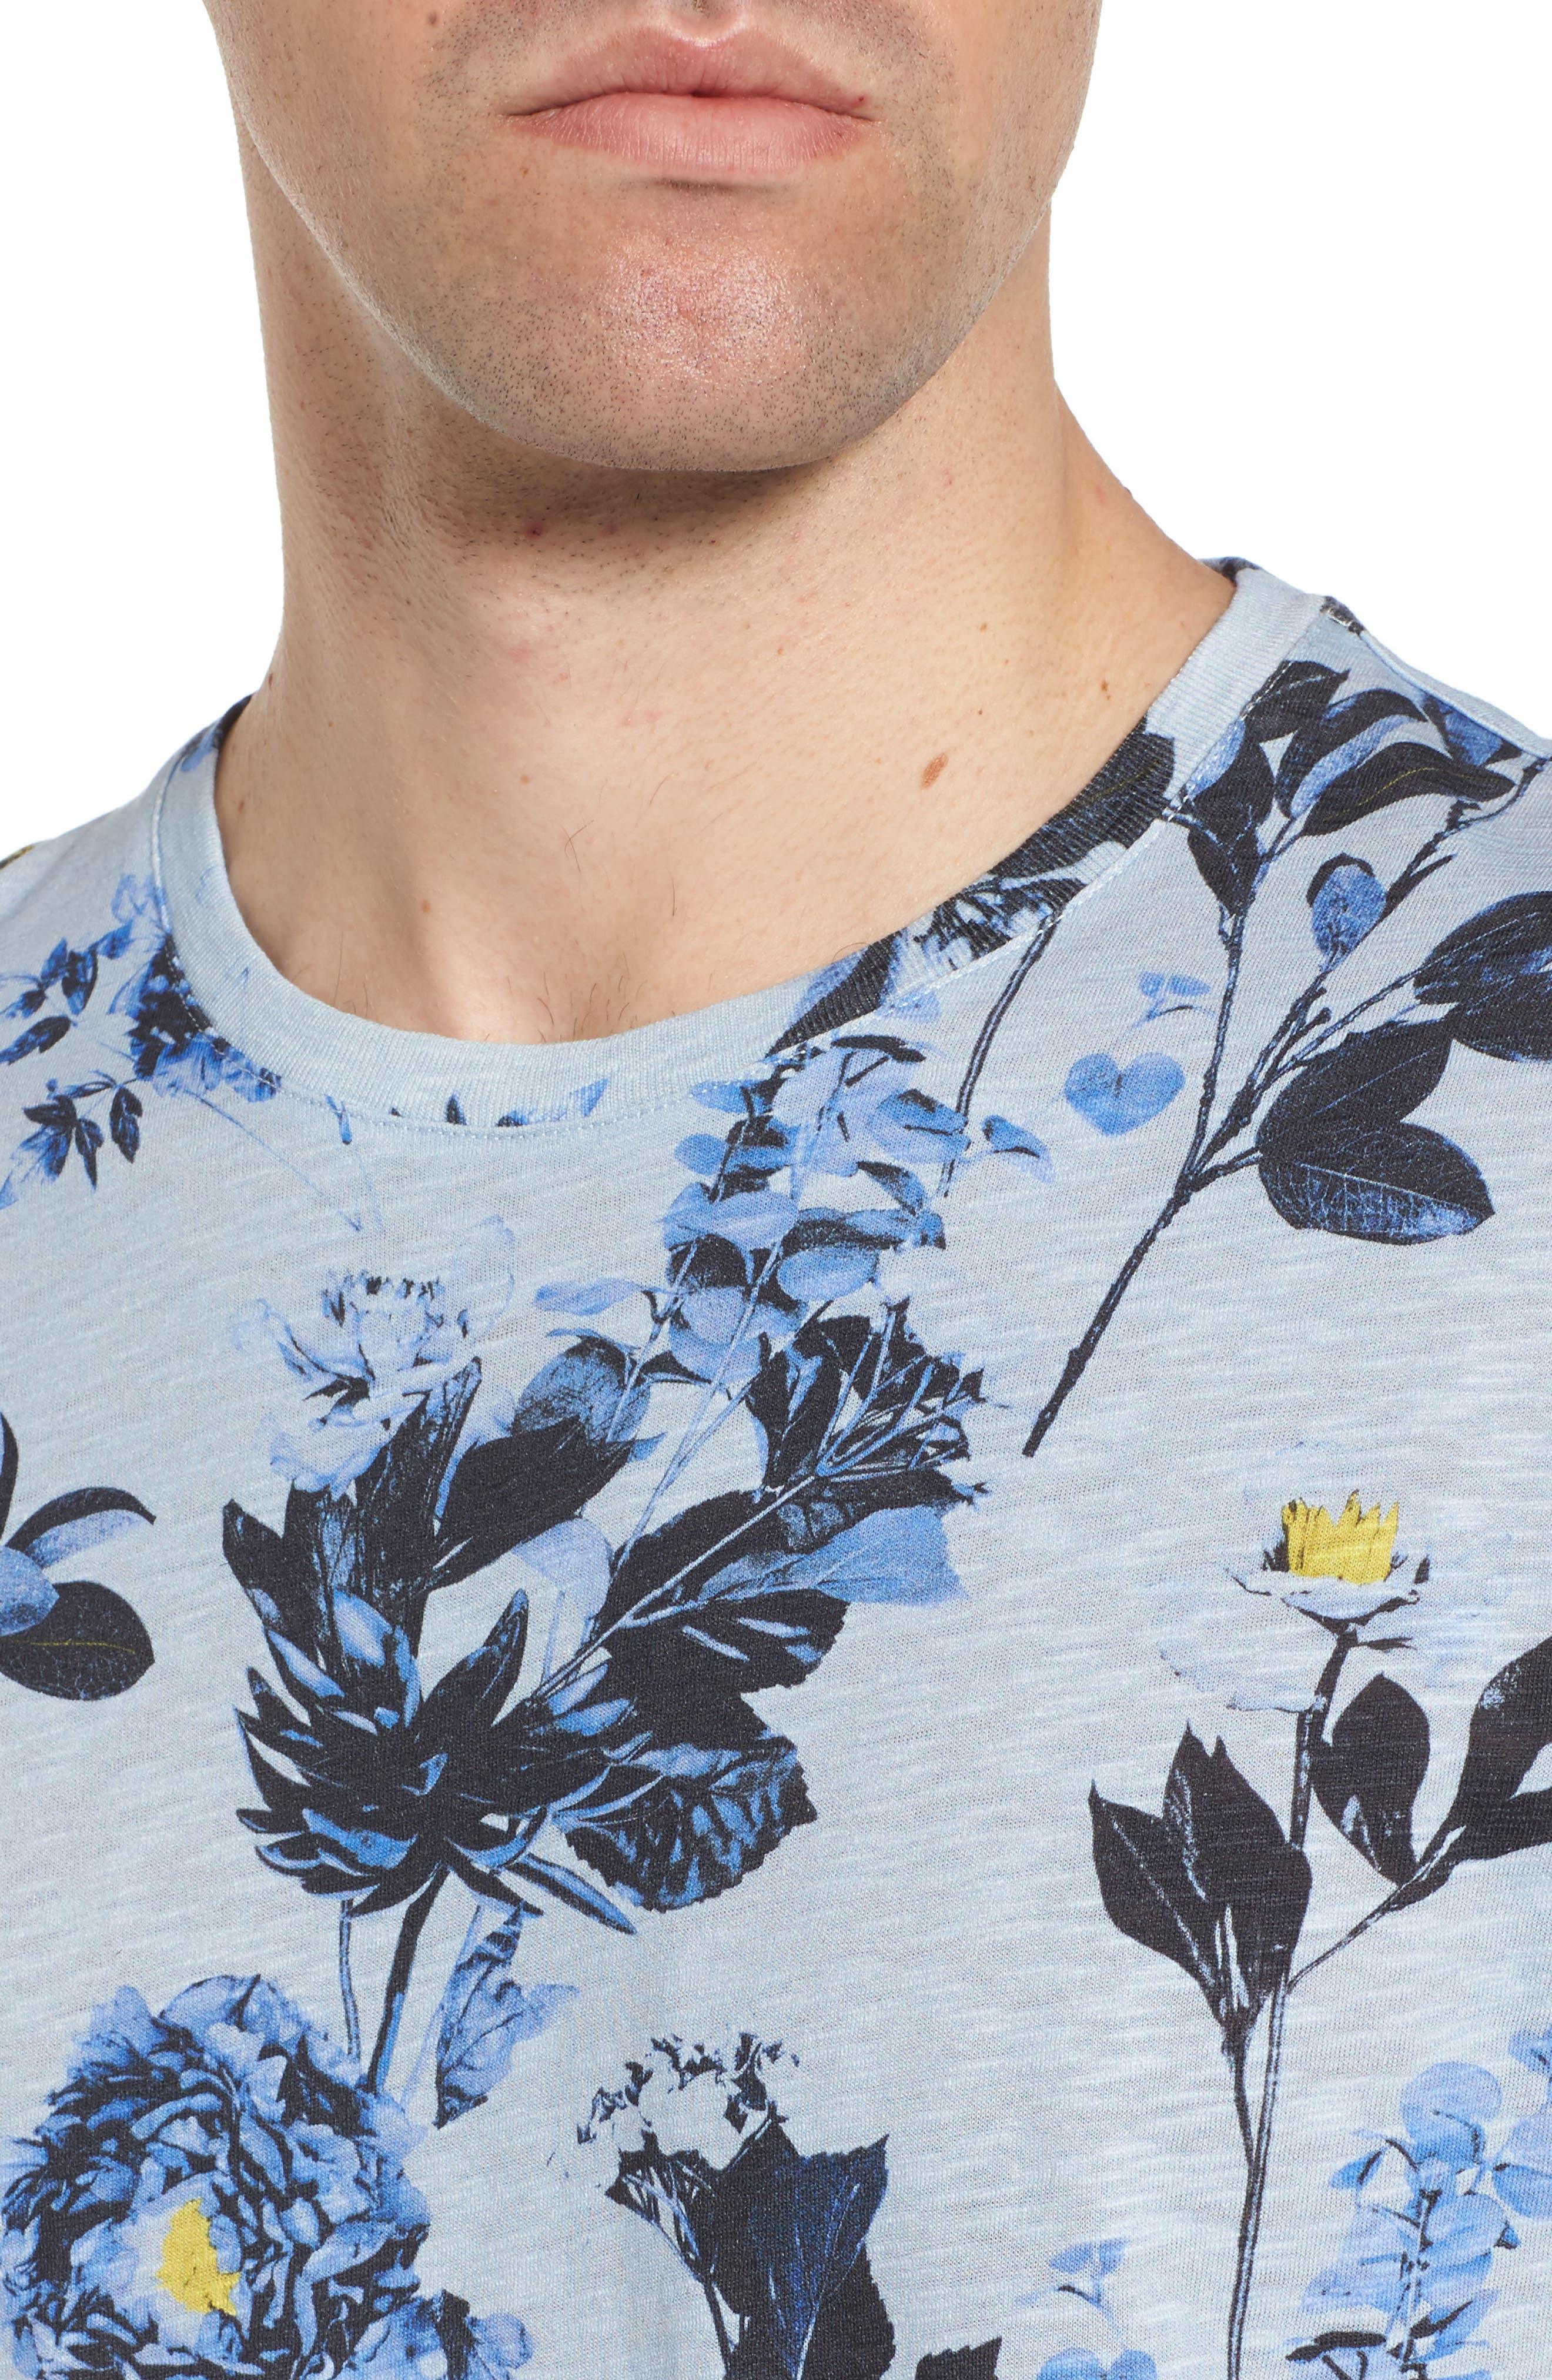 Doberma Trim Fit Floral Print T-Shirt,                             Alternate thumbnail 8, color,